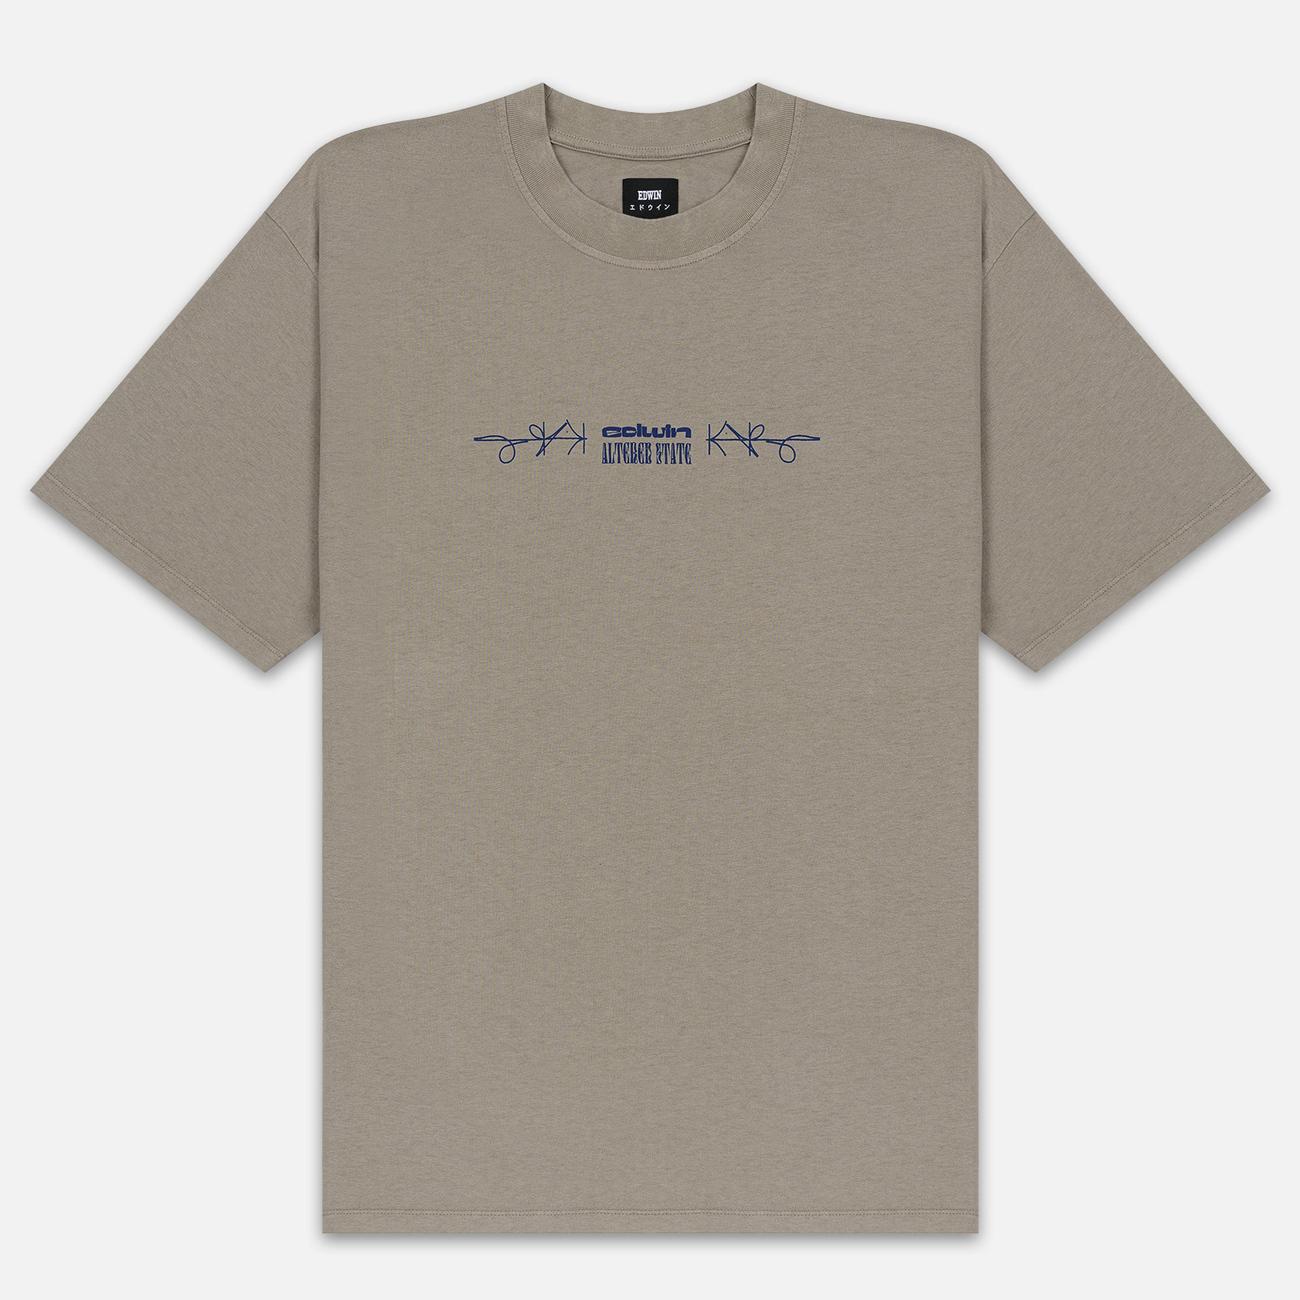 Мужская футболка Edwin Hazy Dreams III Garment Dyed Faded Out Moon Rock